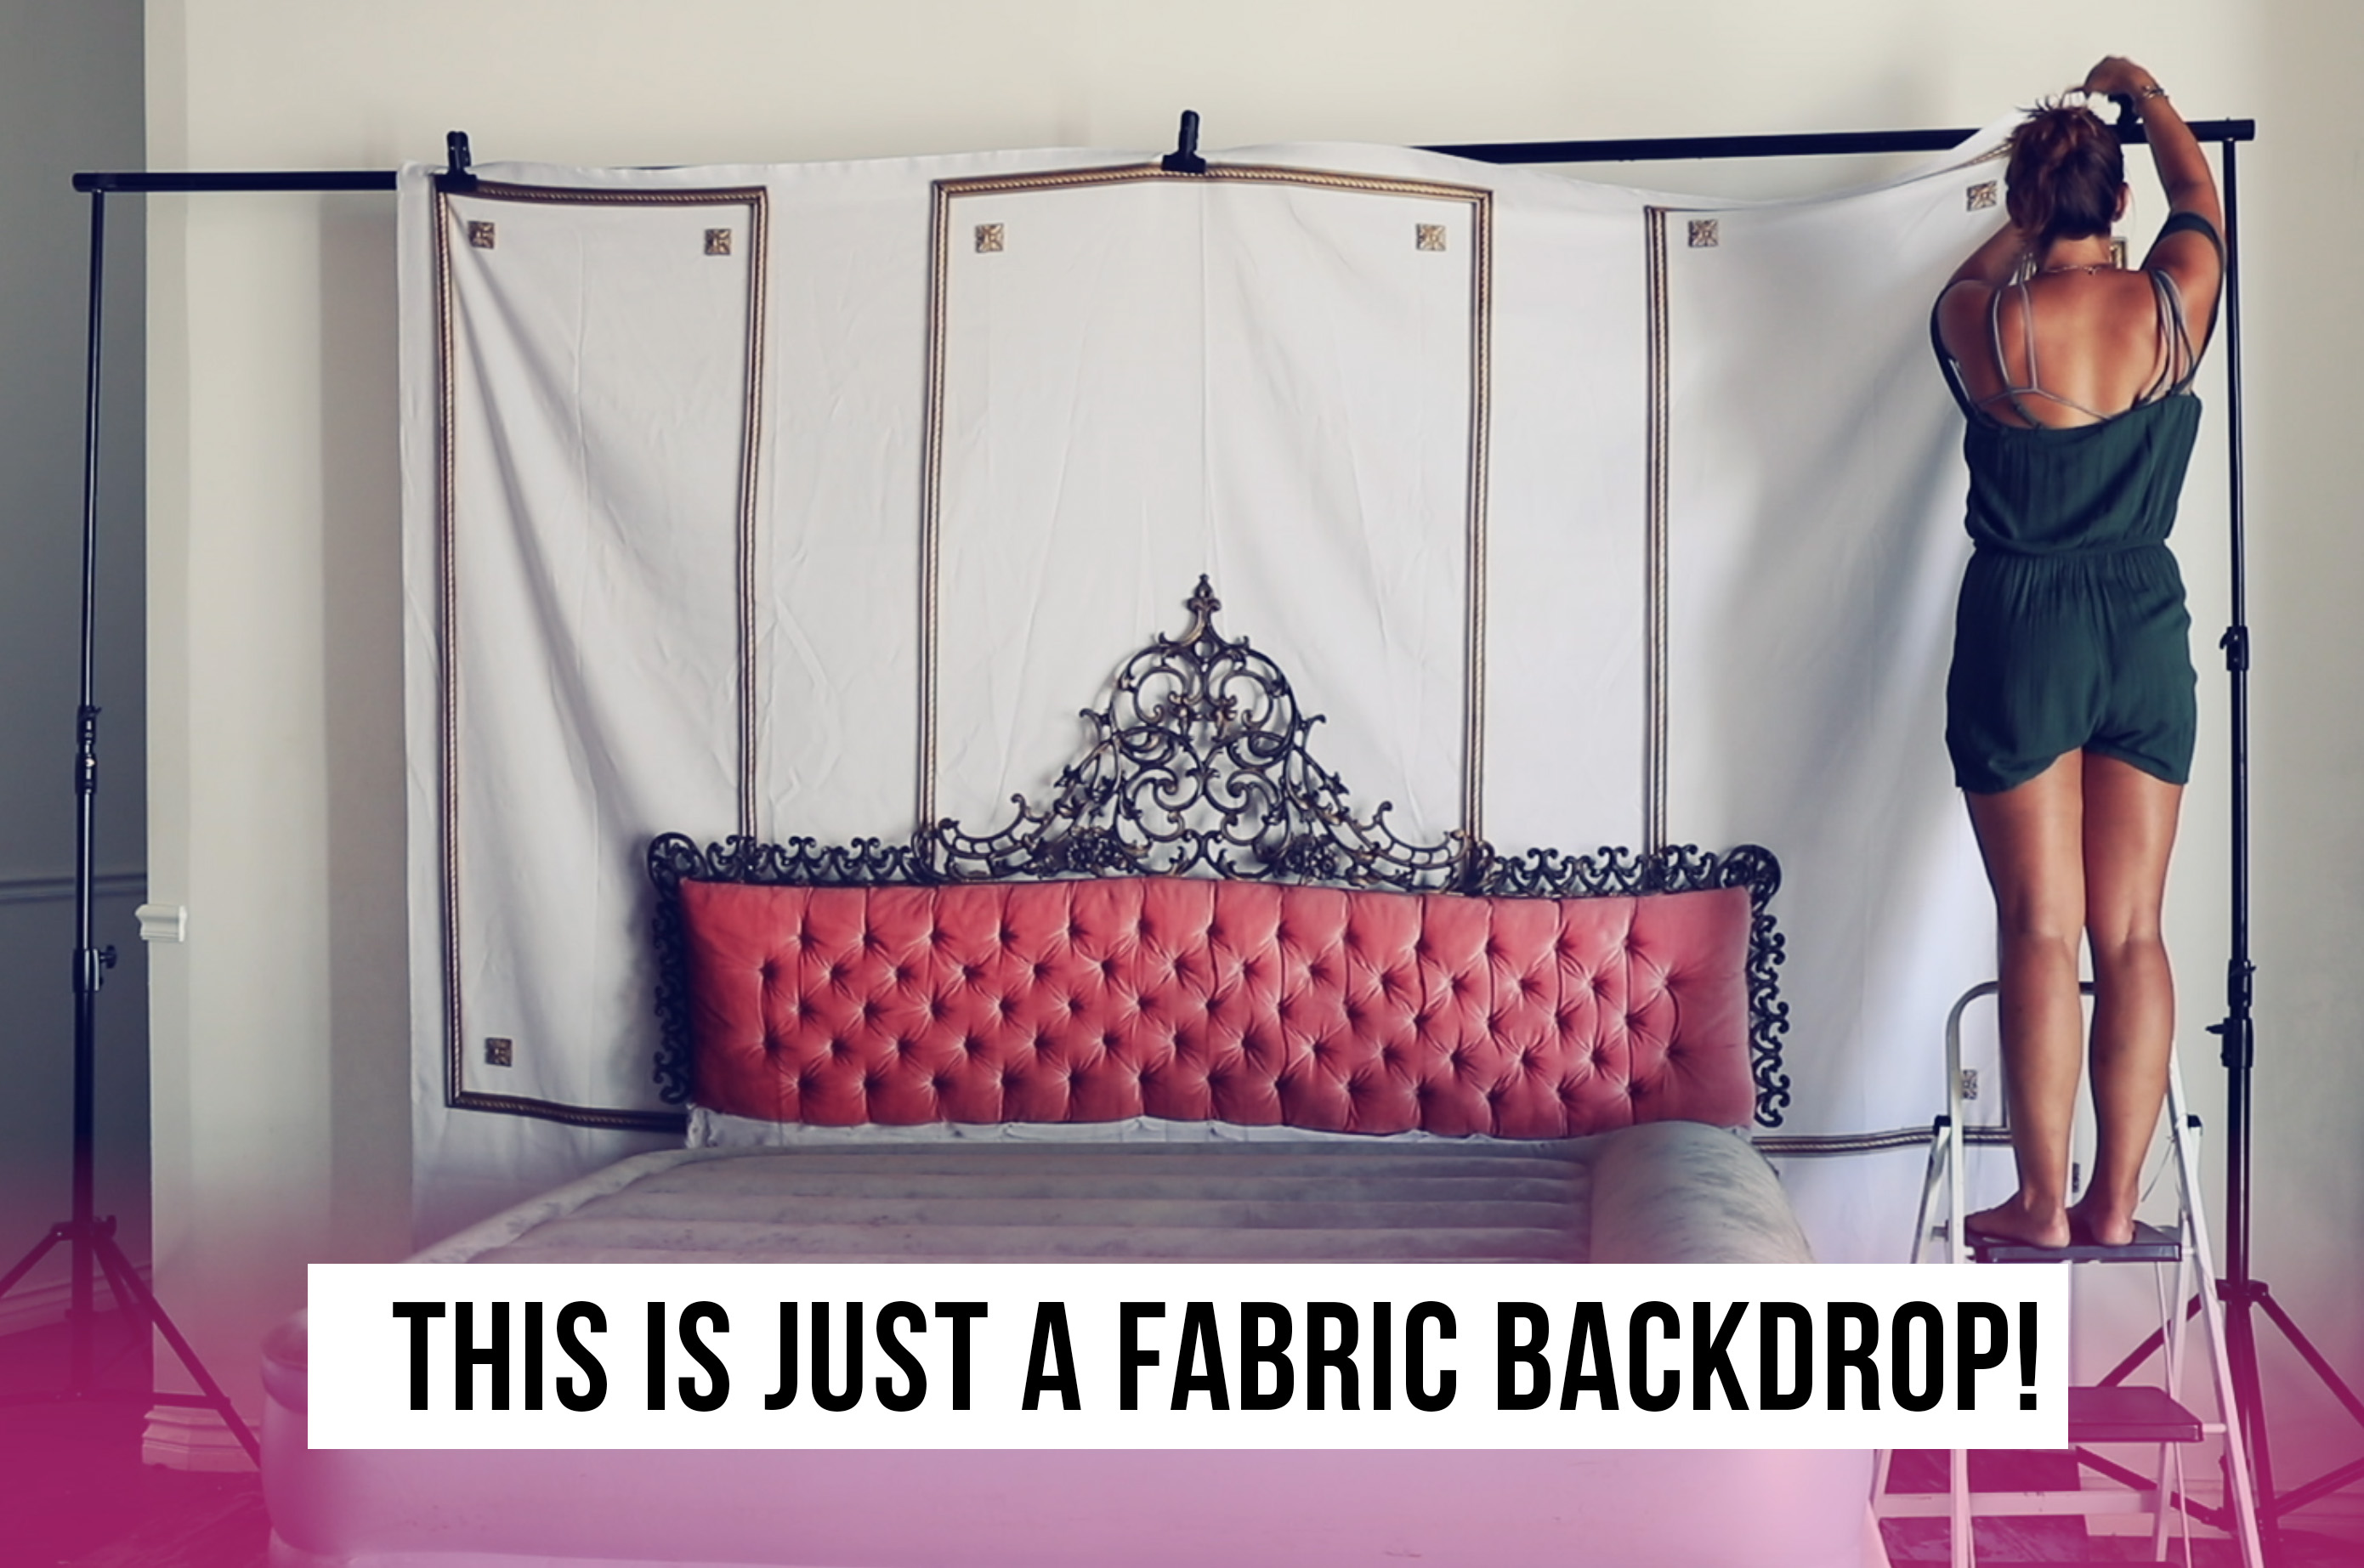 Boudoir Bed Headboard Fabric Backdrop - The Boudoir Divas - San ...